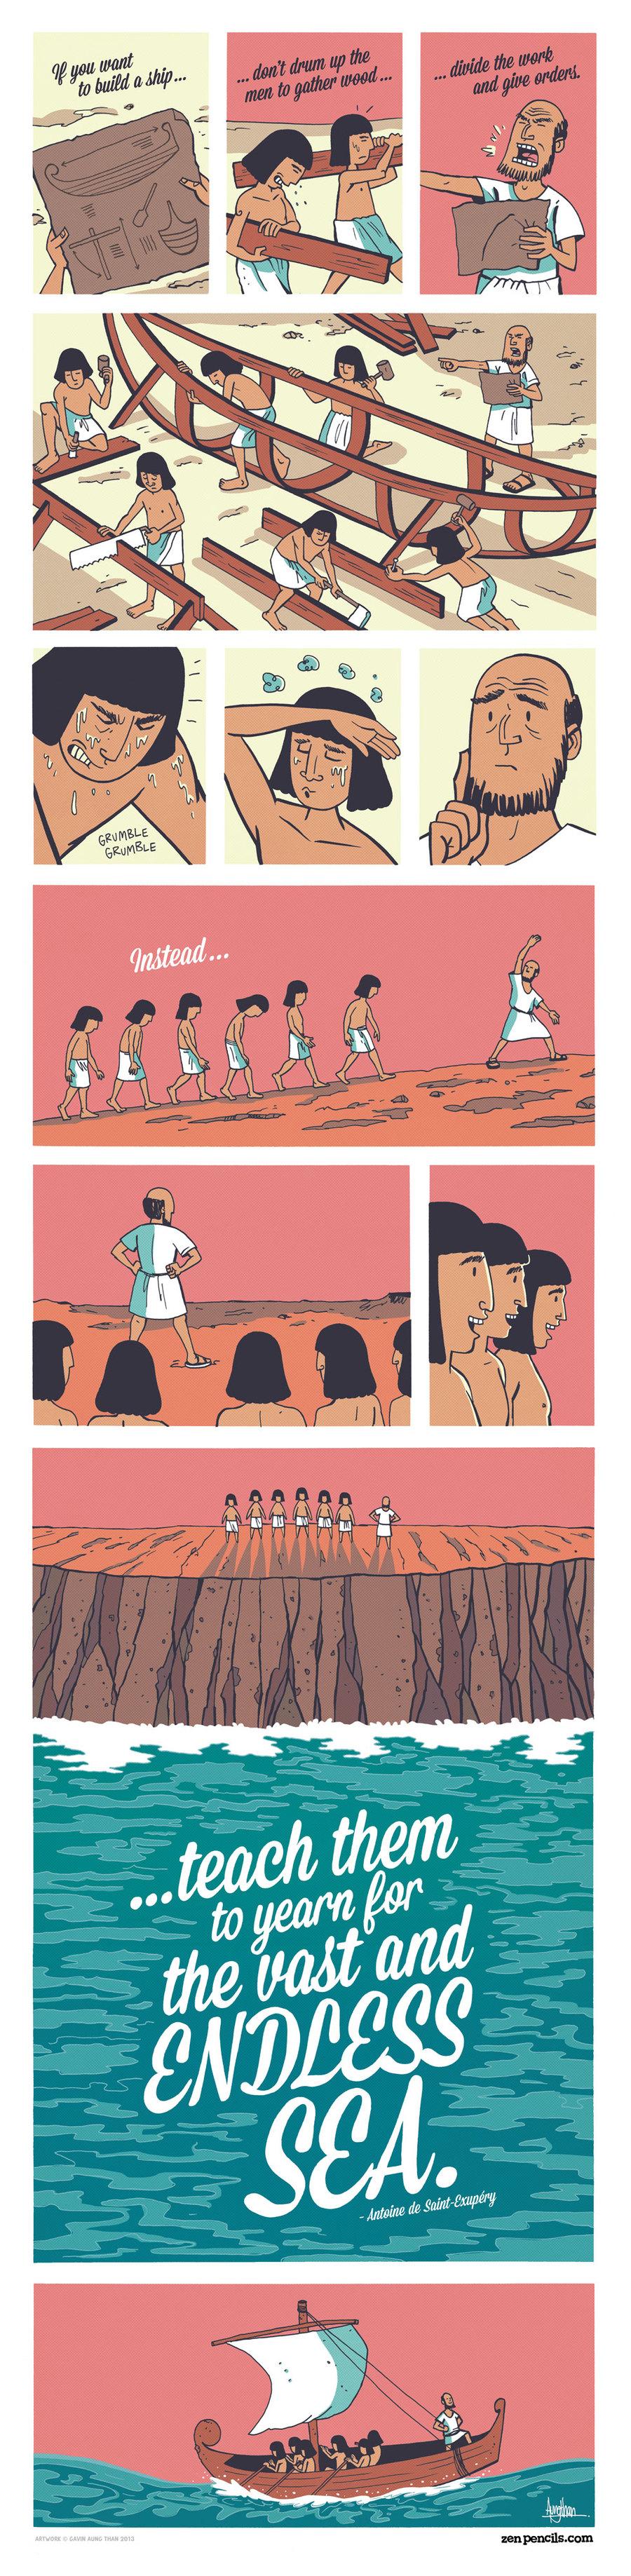 Zen Pencils for Jul 30, 2018 Comic Strip